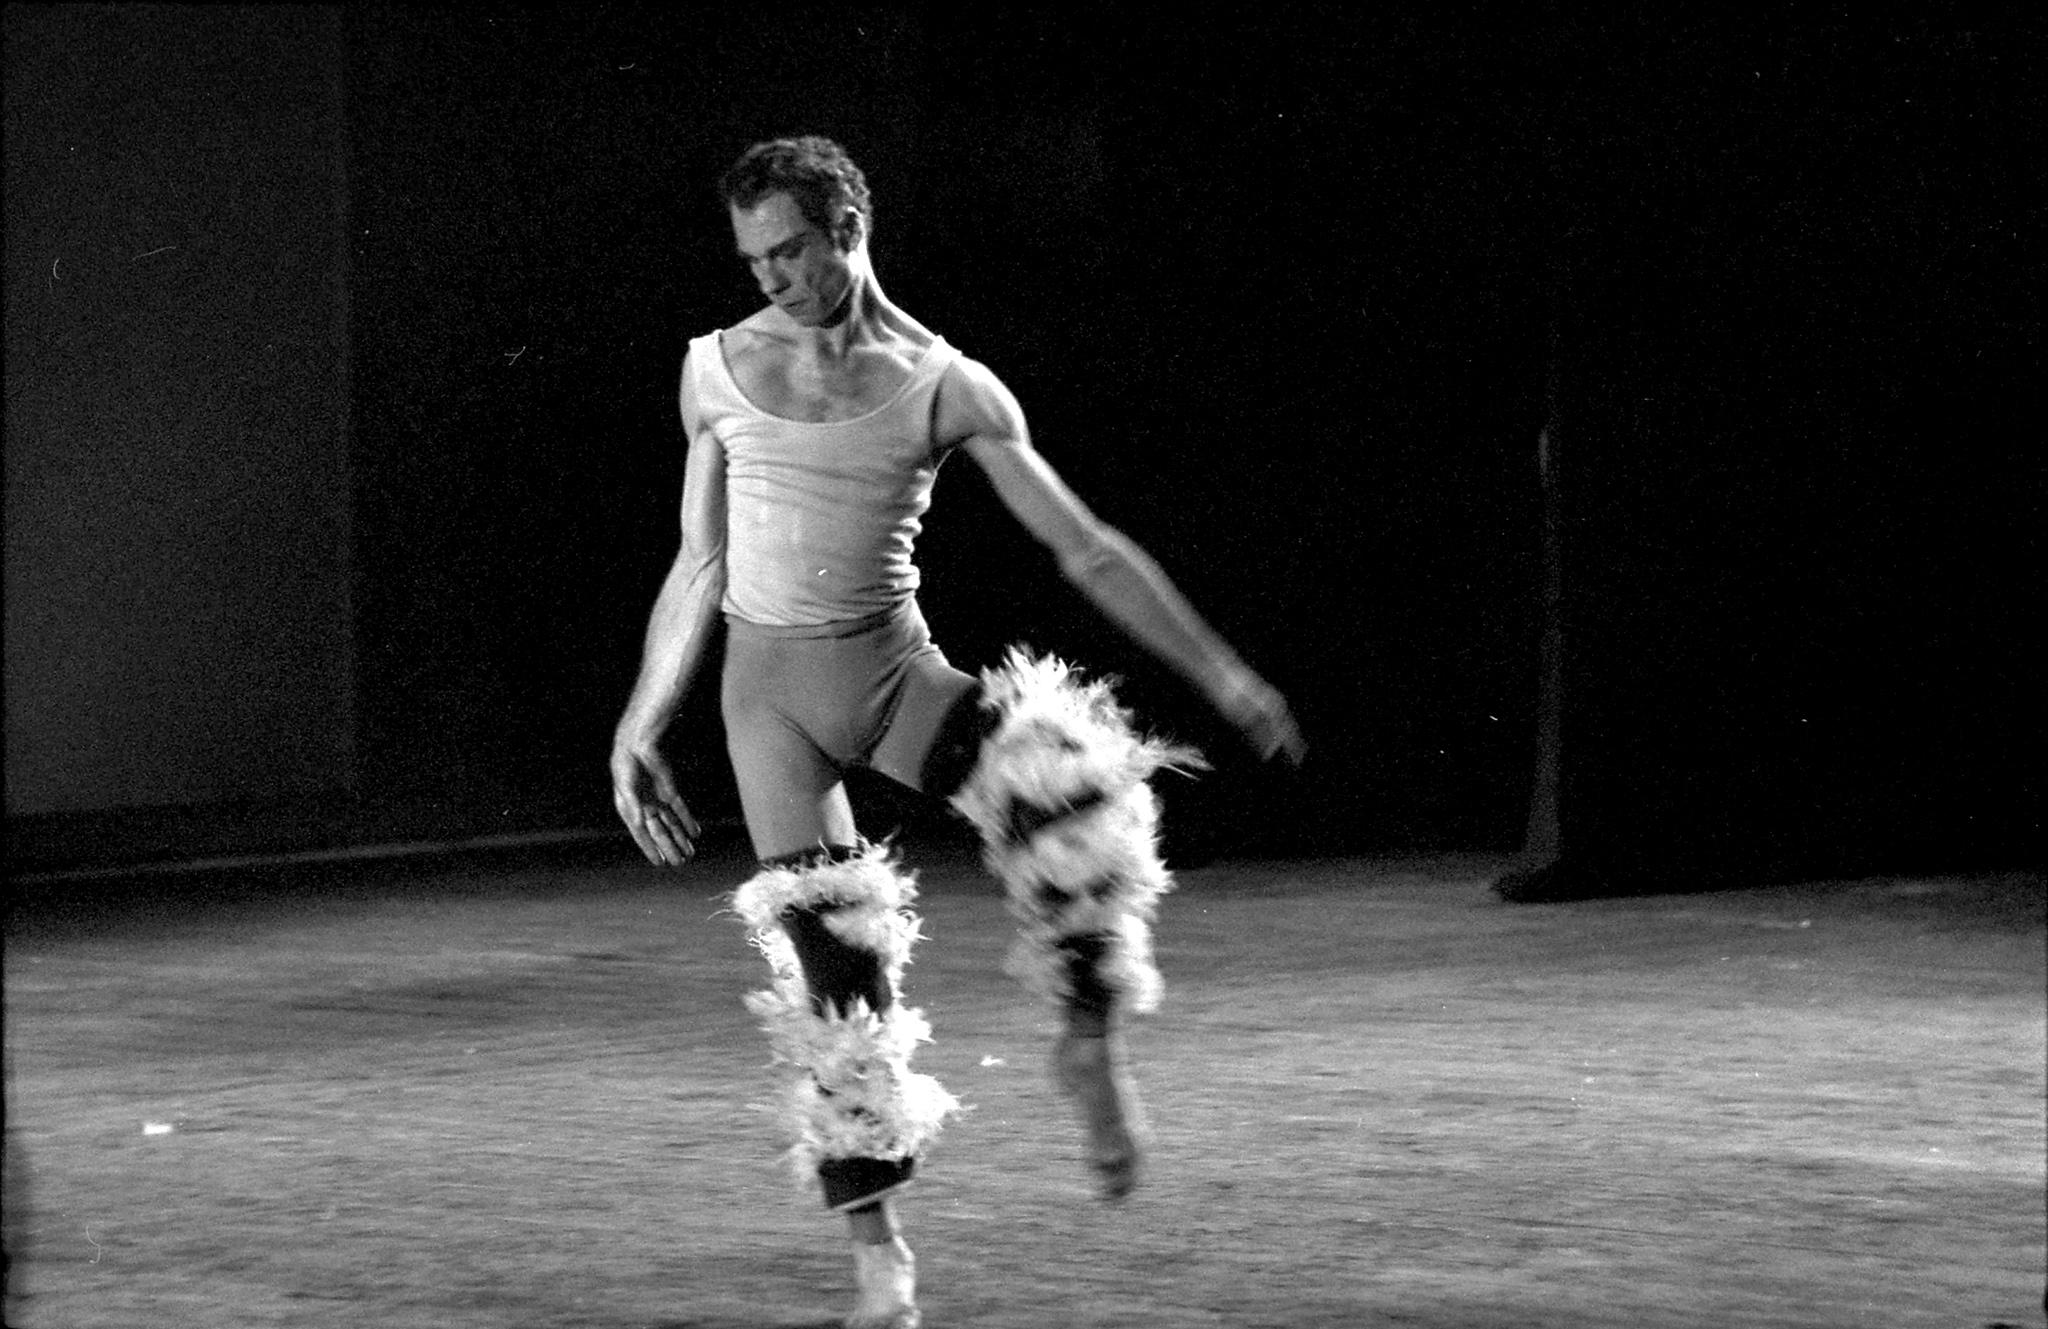 ROBERT RAUCHENBERG FOR MERCE CUNNINGHAM DANCE COMPANY